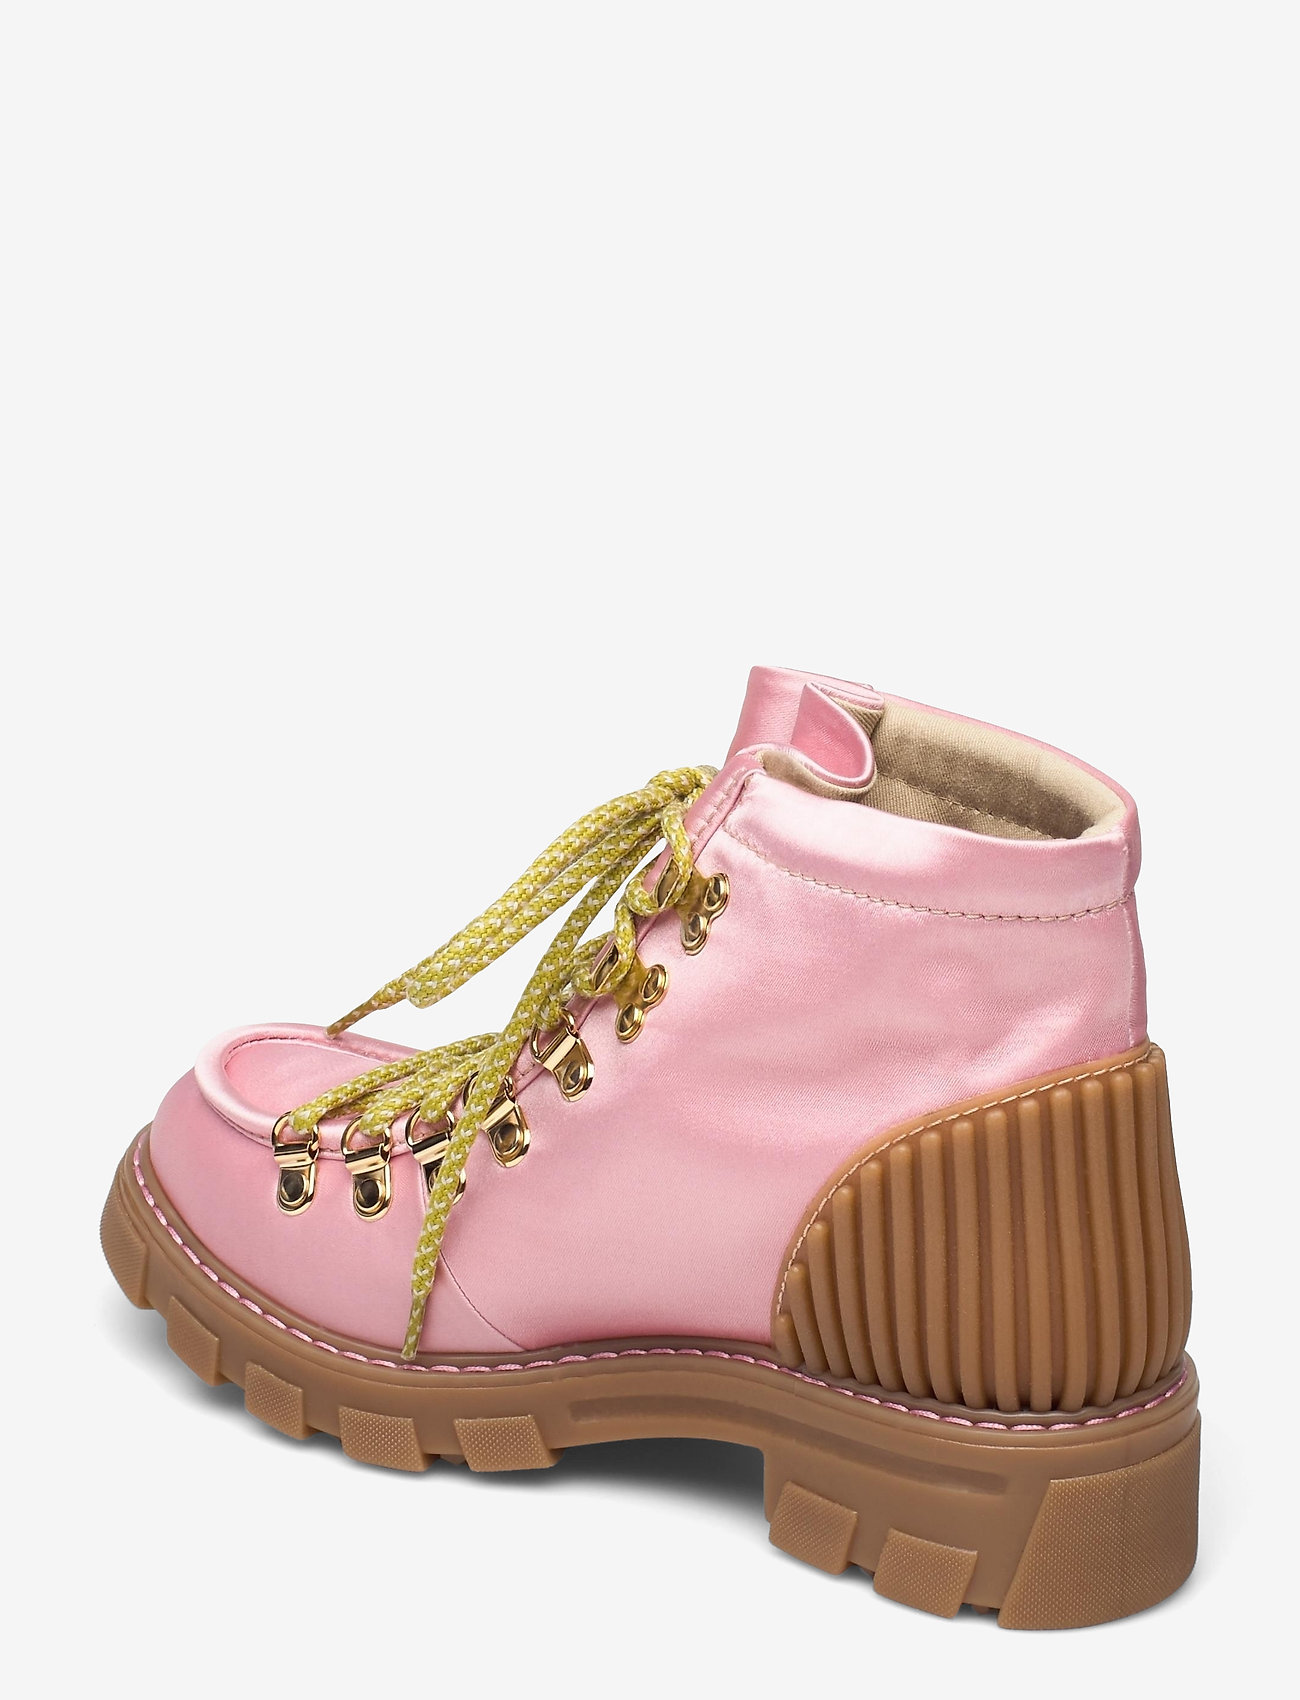 STINE GOYA - Vera, 1154 Satin Boots - flade ankelstøvler - pink - 2